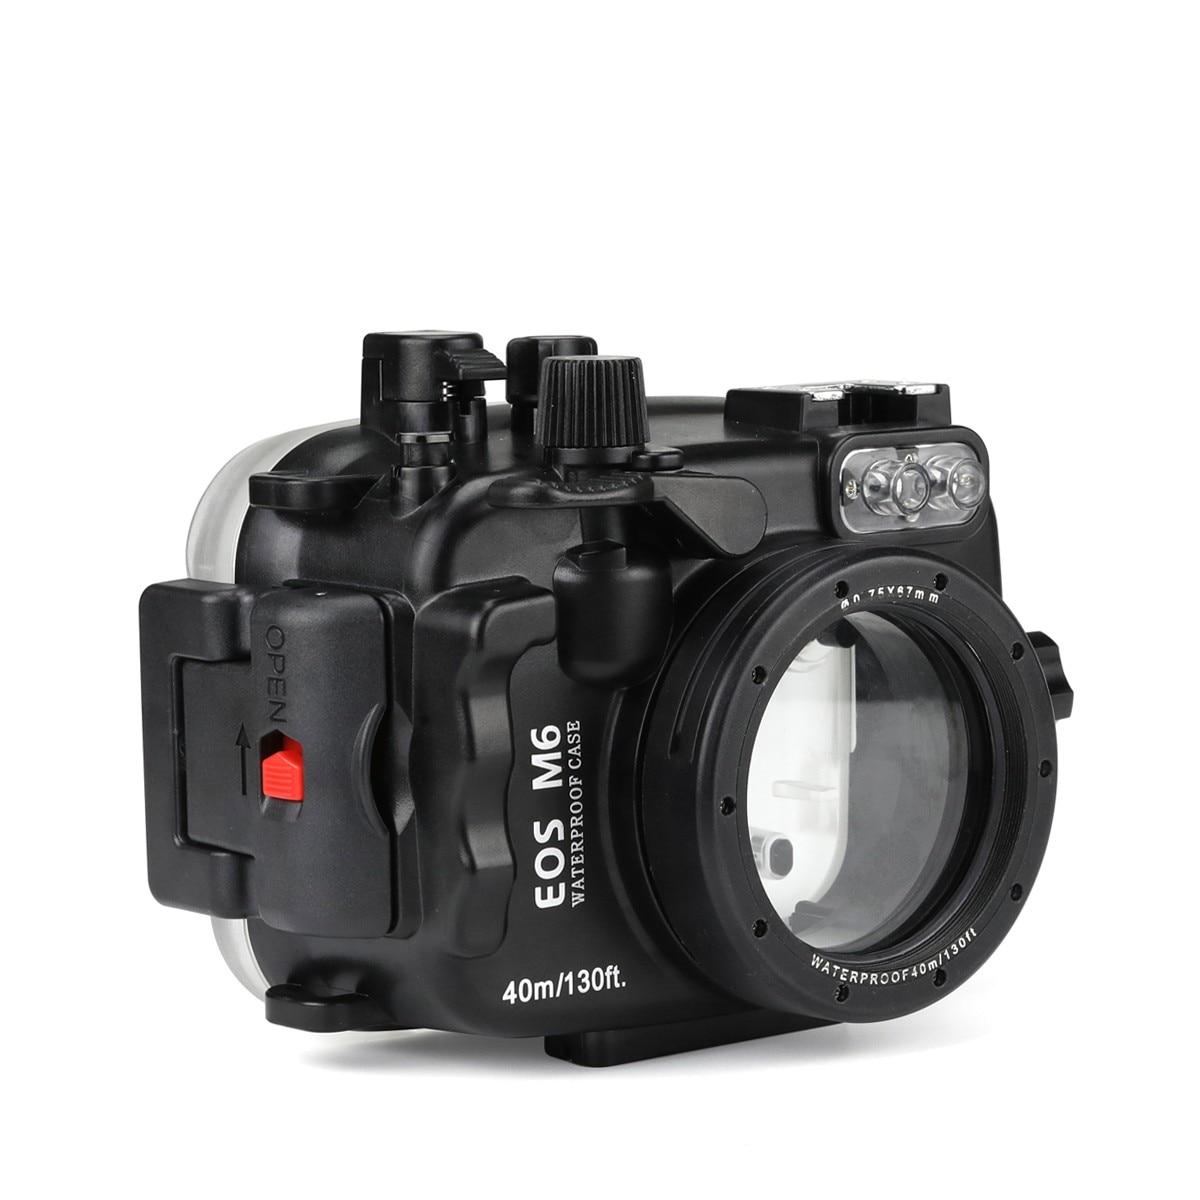 все цены на SeaFrogs 40m/130ft Underwater Camera Housing For Canon EOS M6 22mm Lens Waterproof Camera Bags Case For Canon EOS M6 22mm